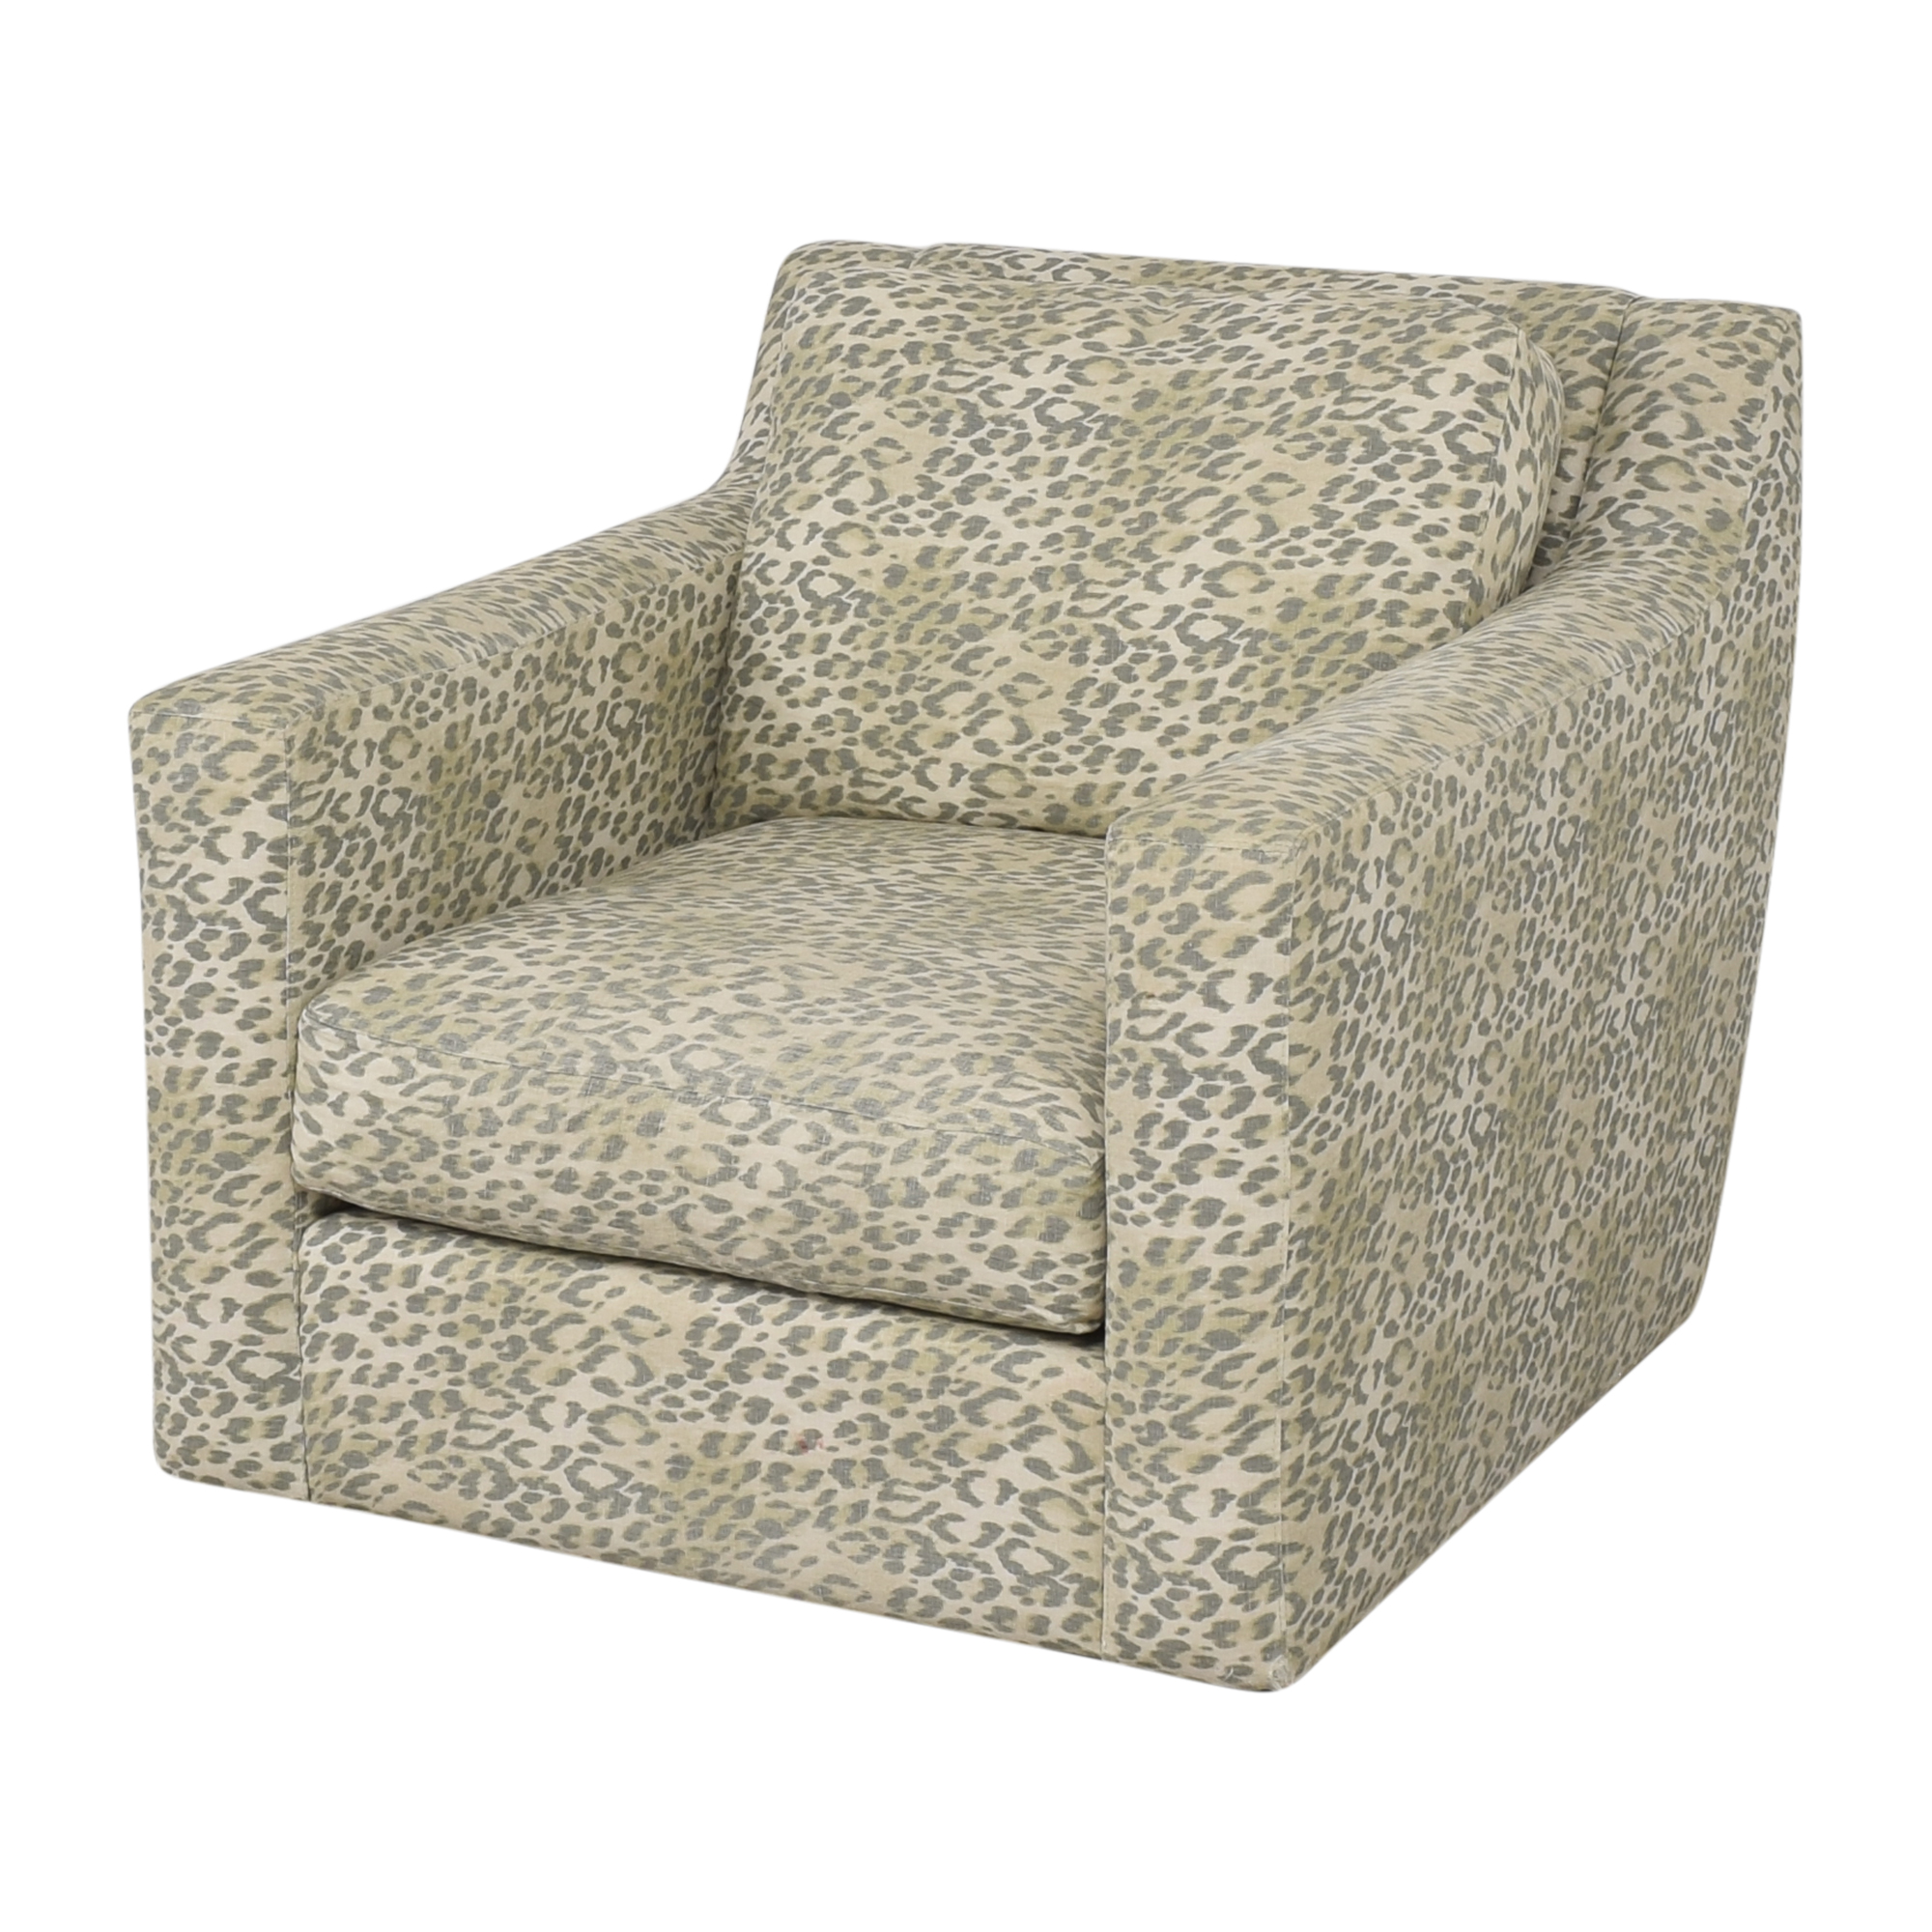 Lillian August Lillian August Swivel Chair pa